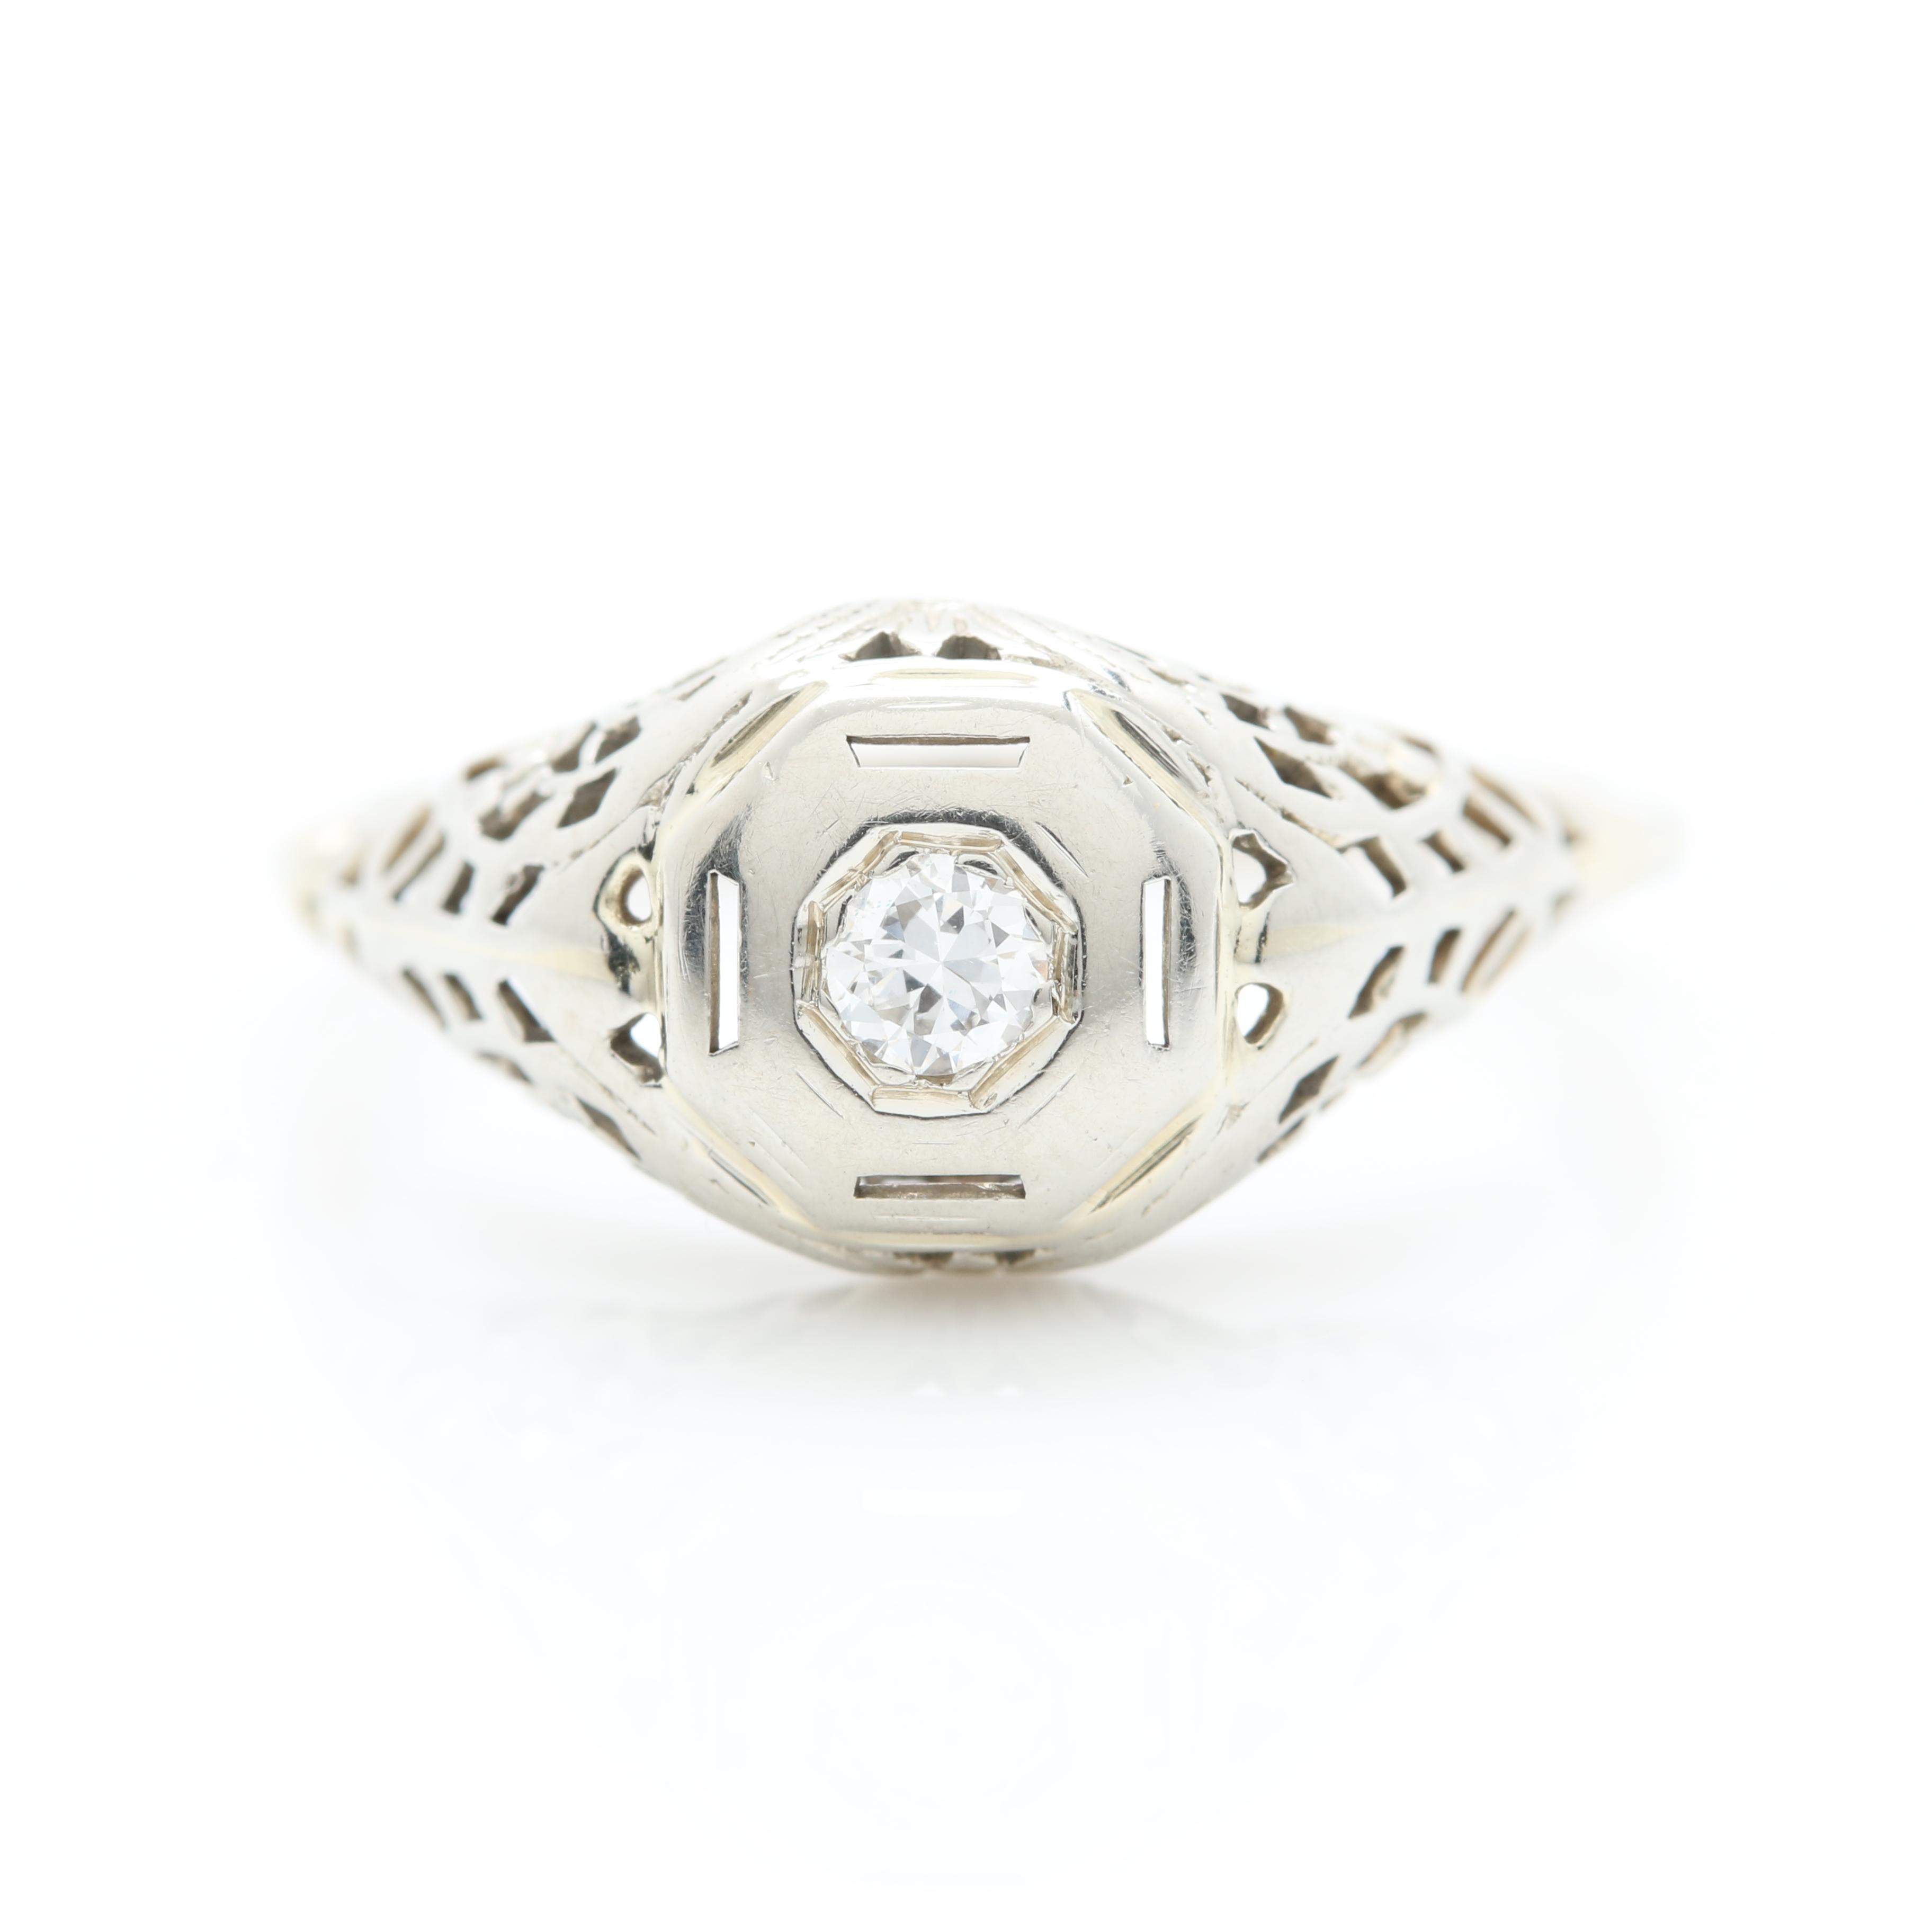 Edwardian 14K and 18K White Gold Diamond Ring